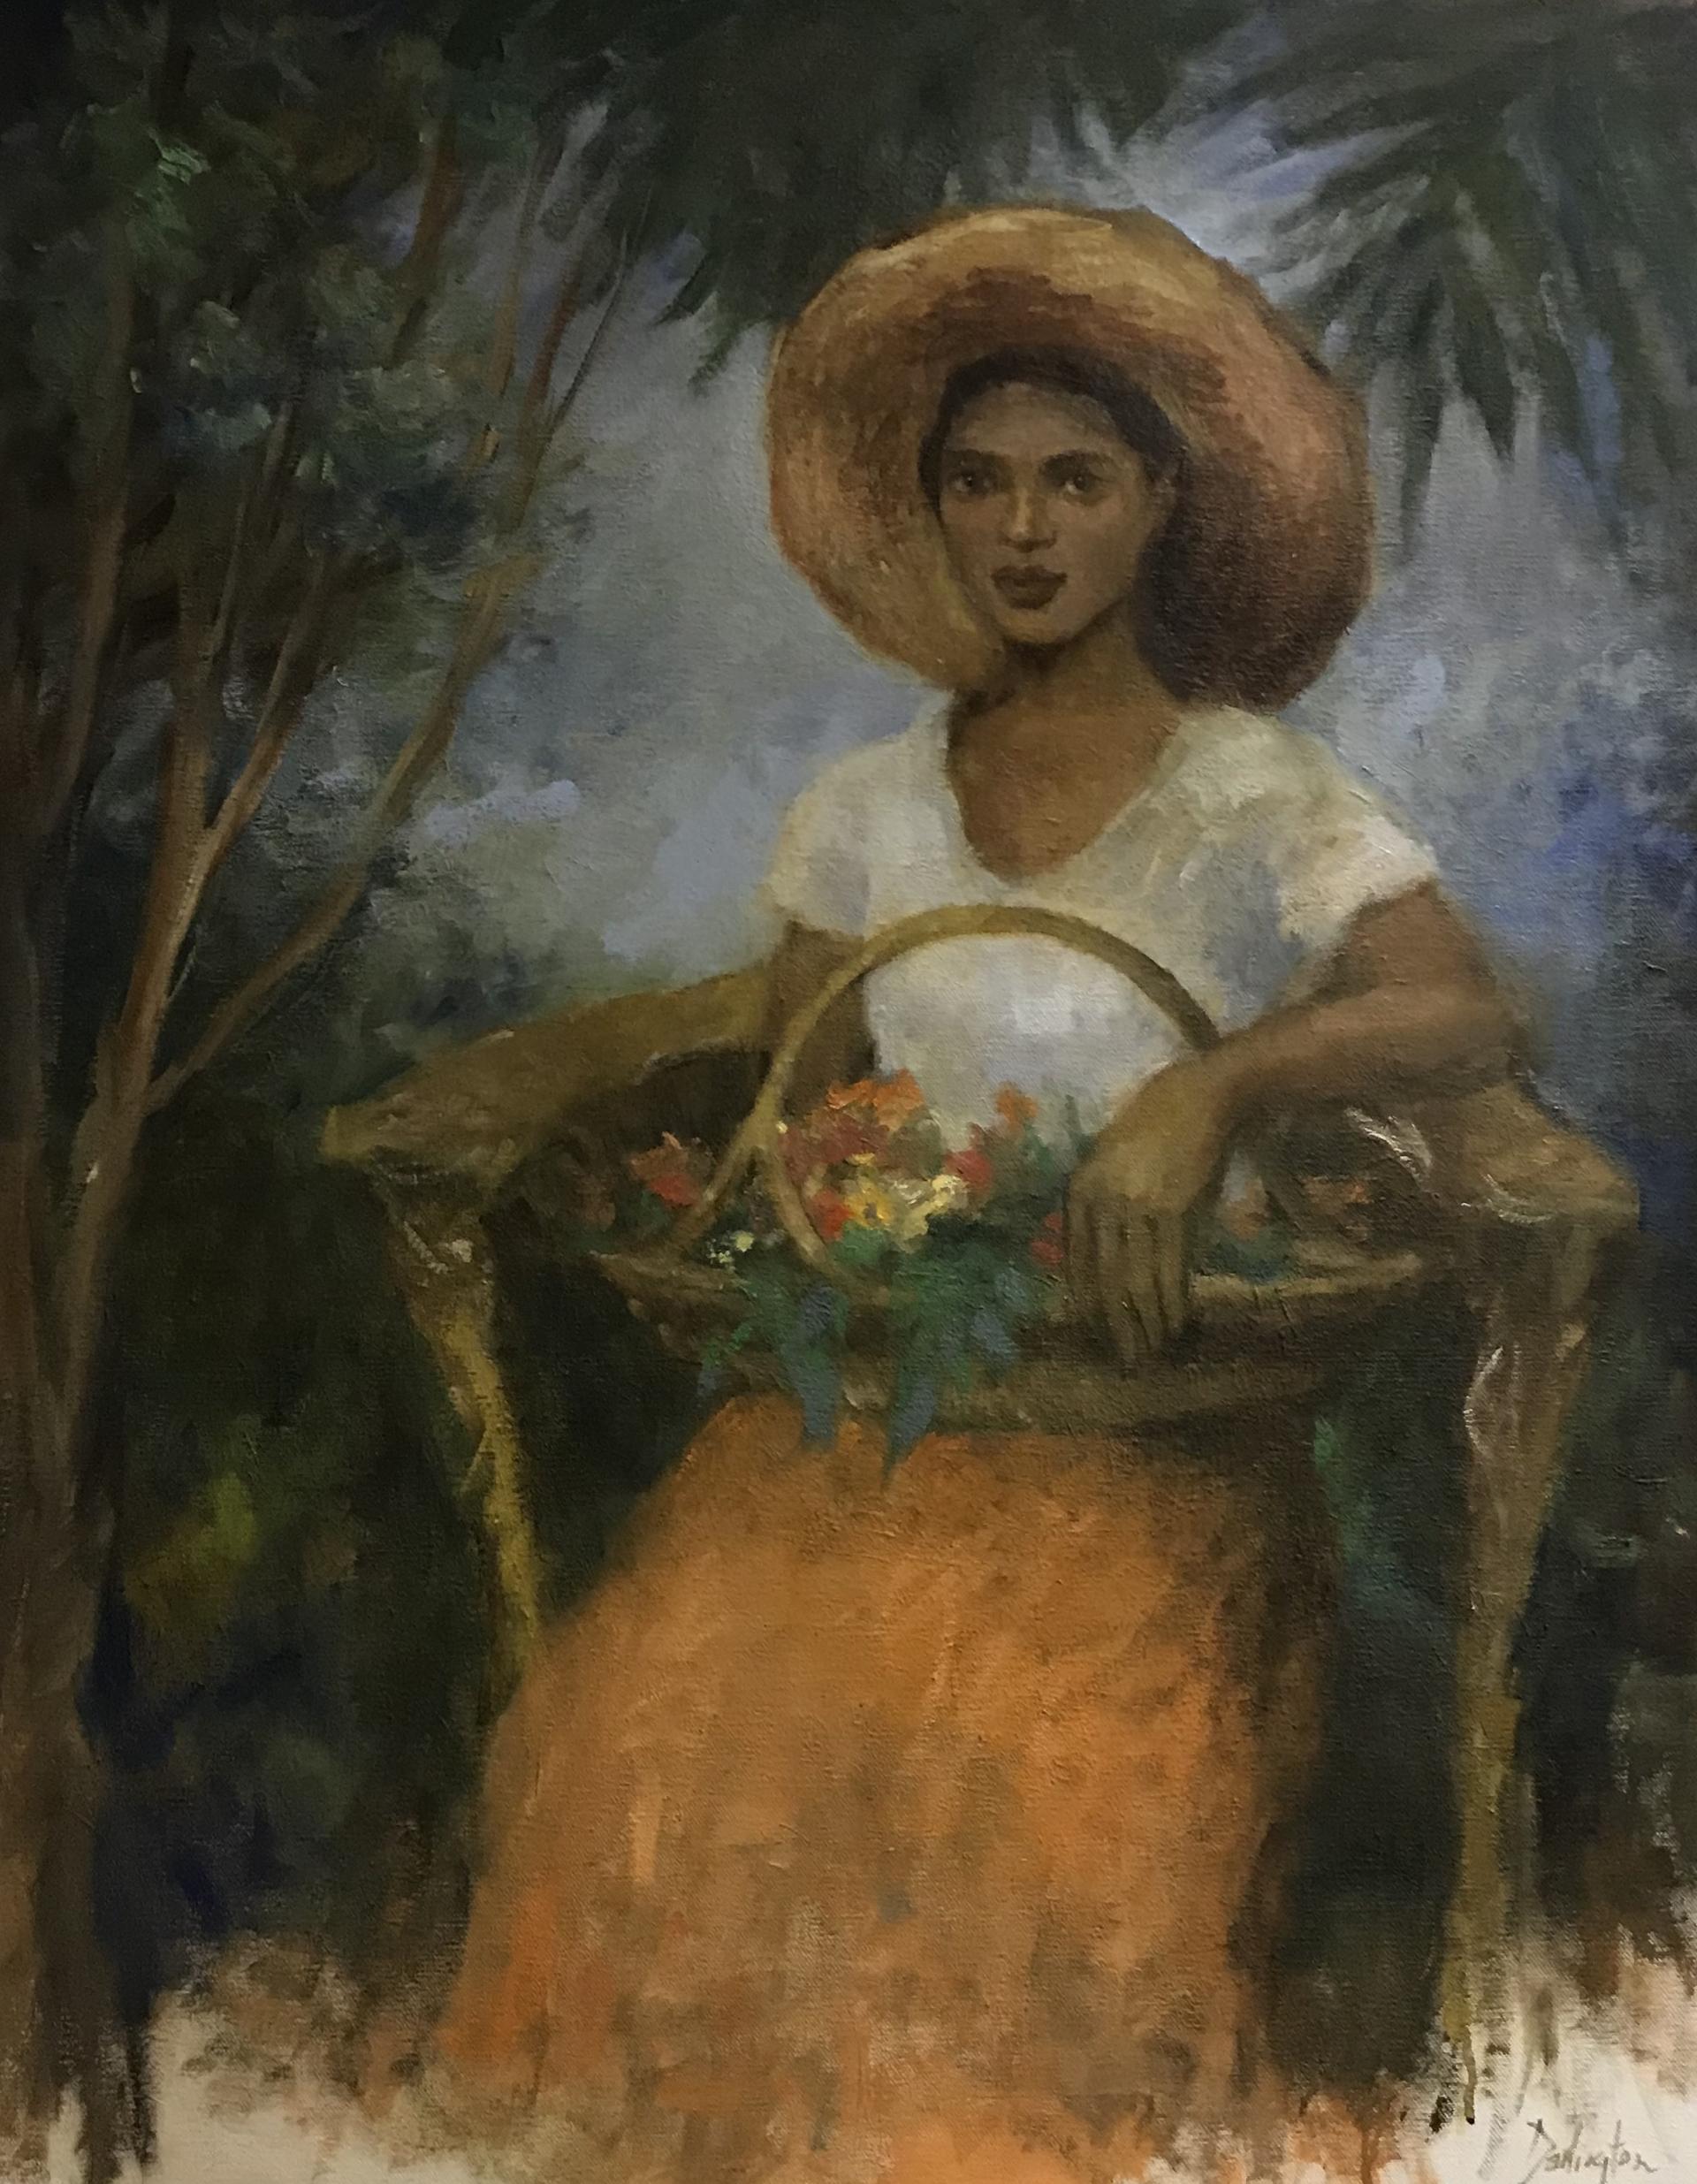 Girl with Sweetgrass Basket by Jim Darlington